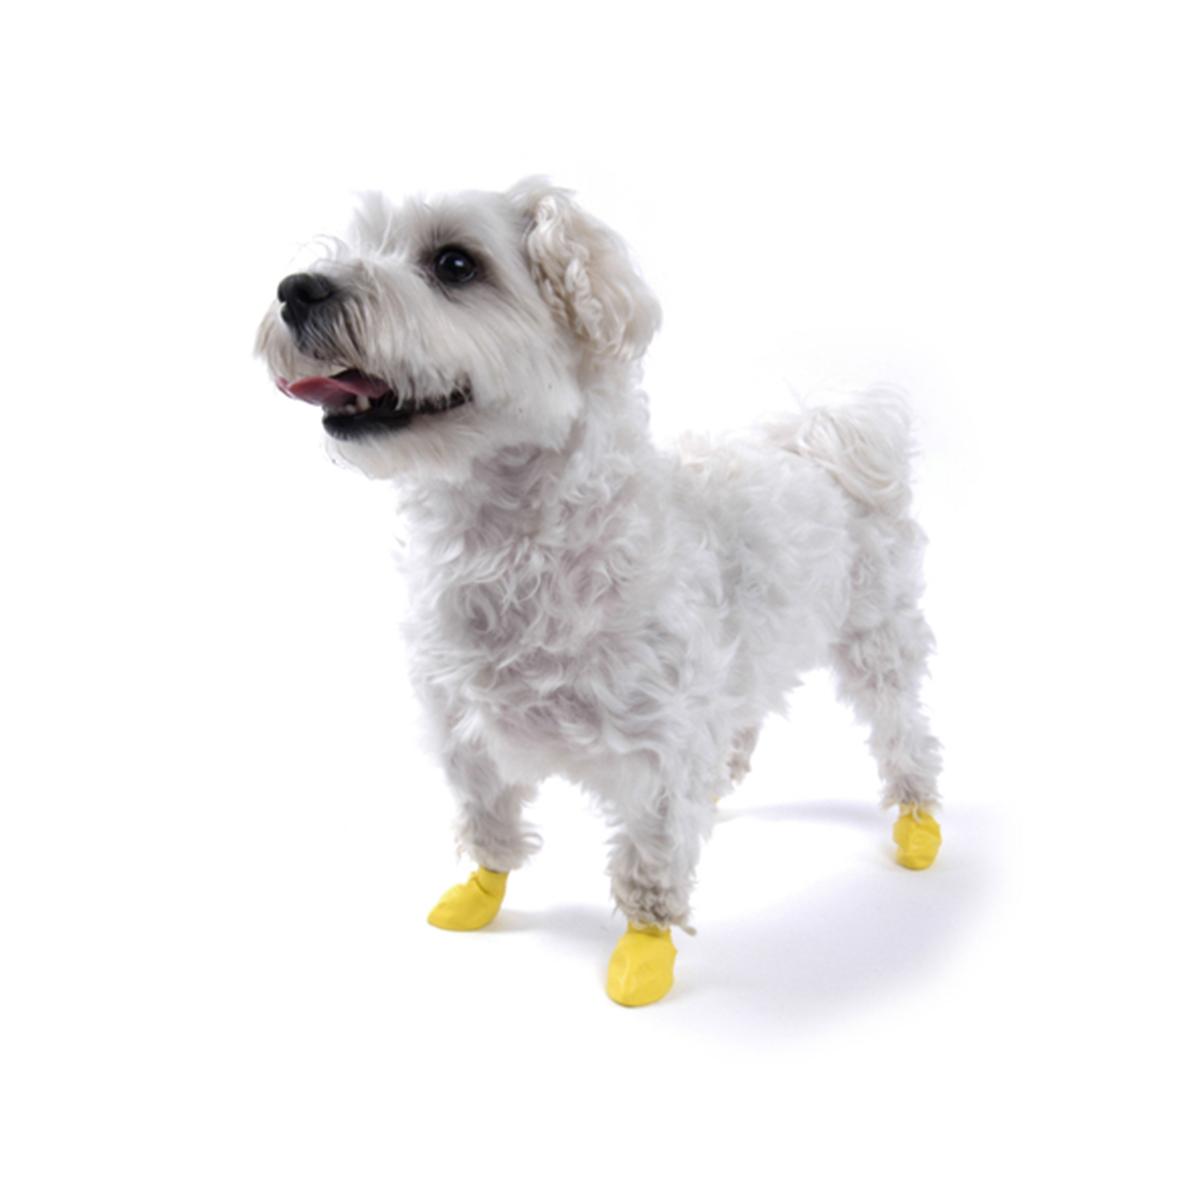 PawZ Disposable Dog Booties 12pk - XX-Small Yellow